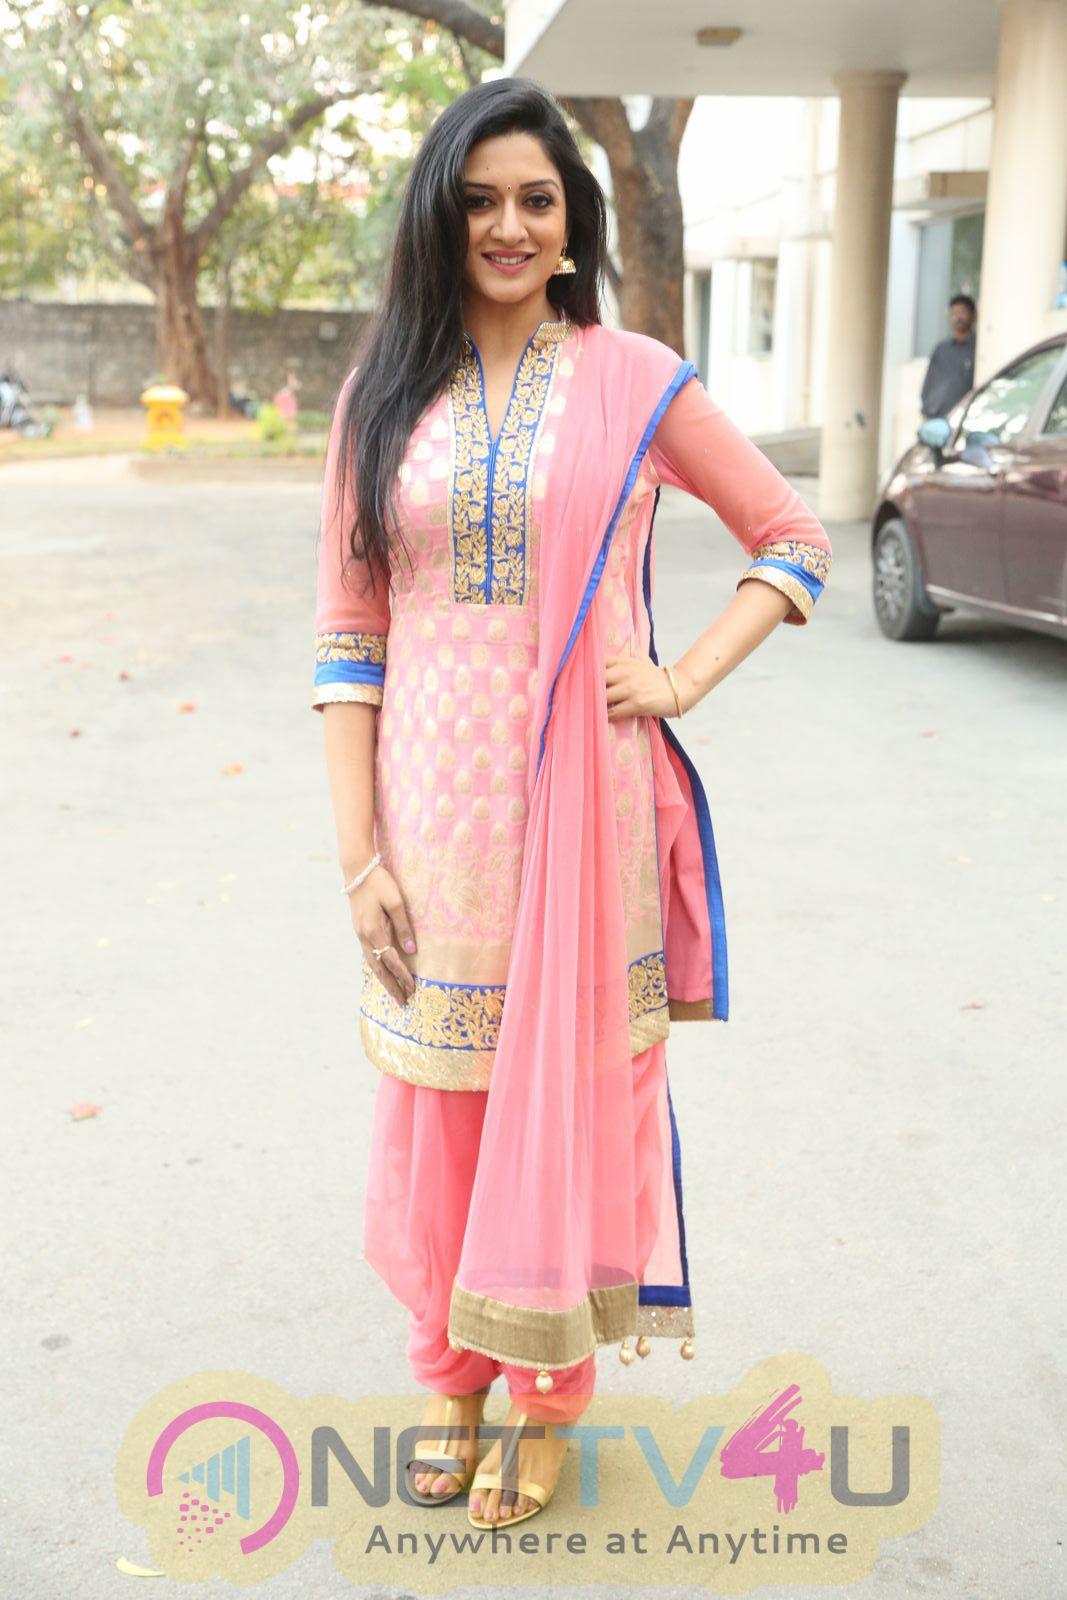 Favourite Actress Vimala Raman Prepossessing Photos